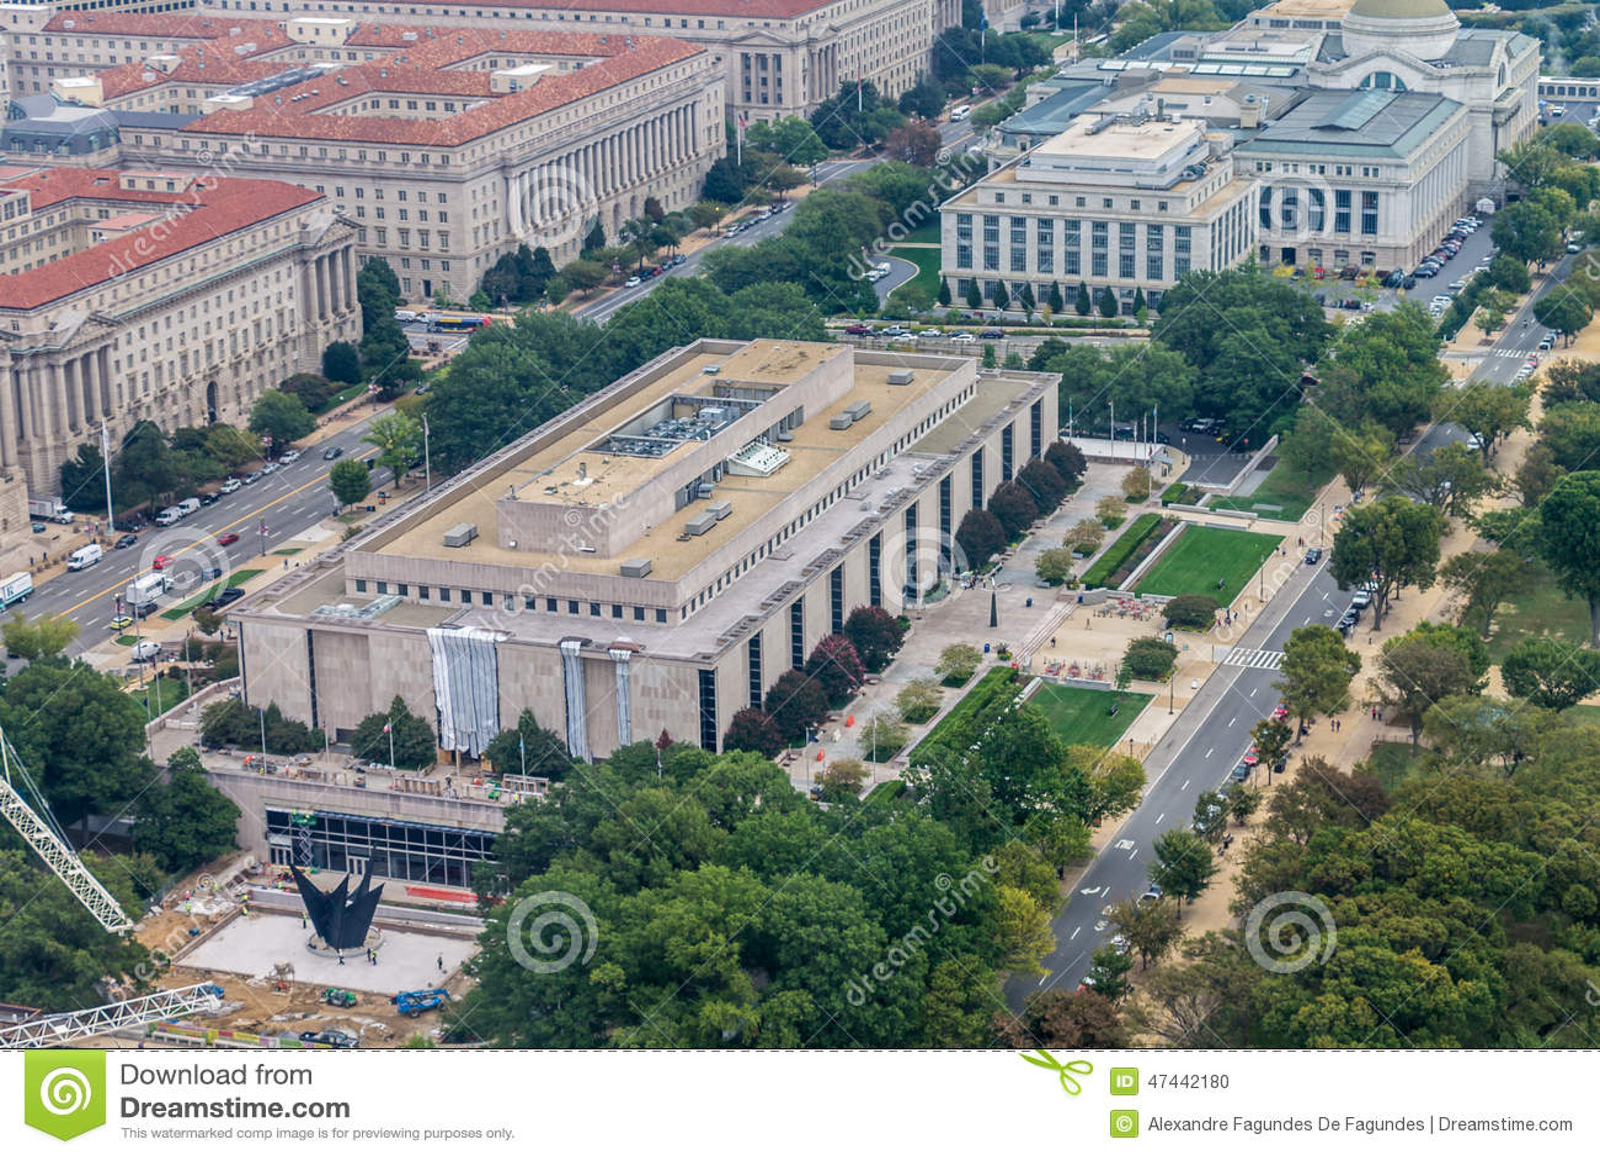 Museo Smithsonian.Smithsonian National Museum Of American History Washington Dc